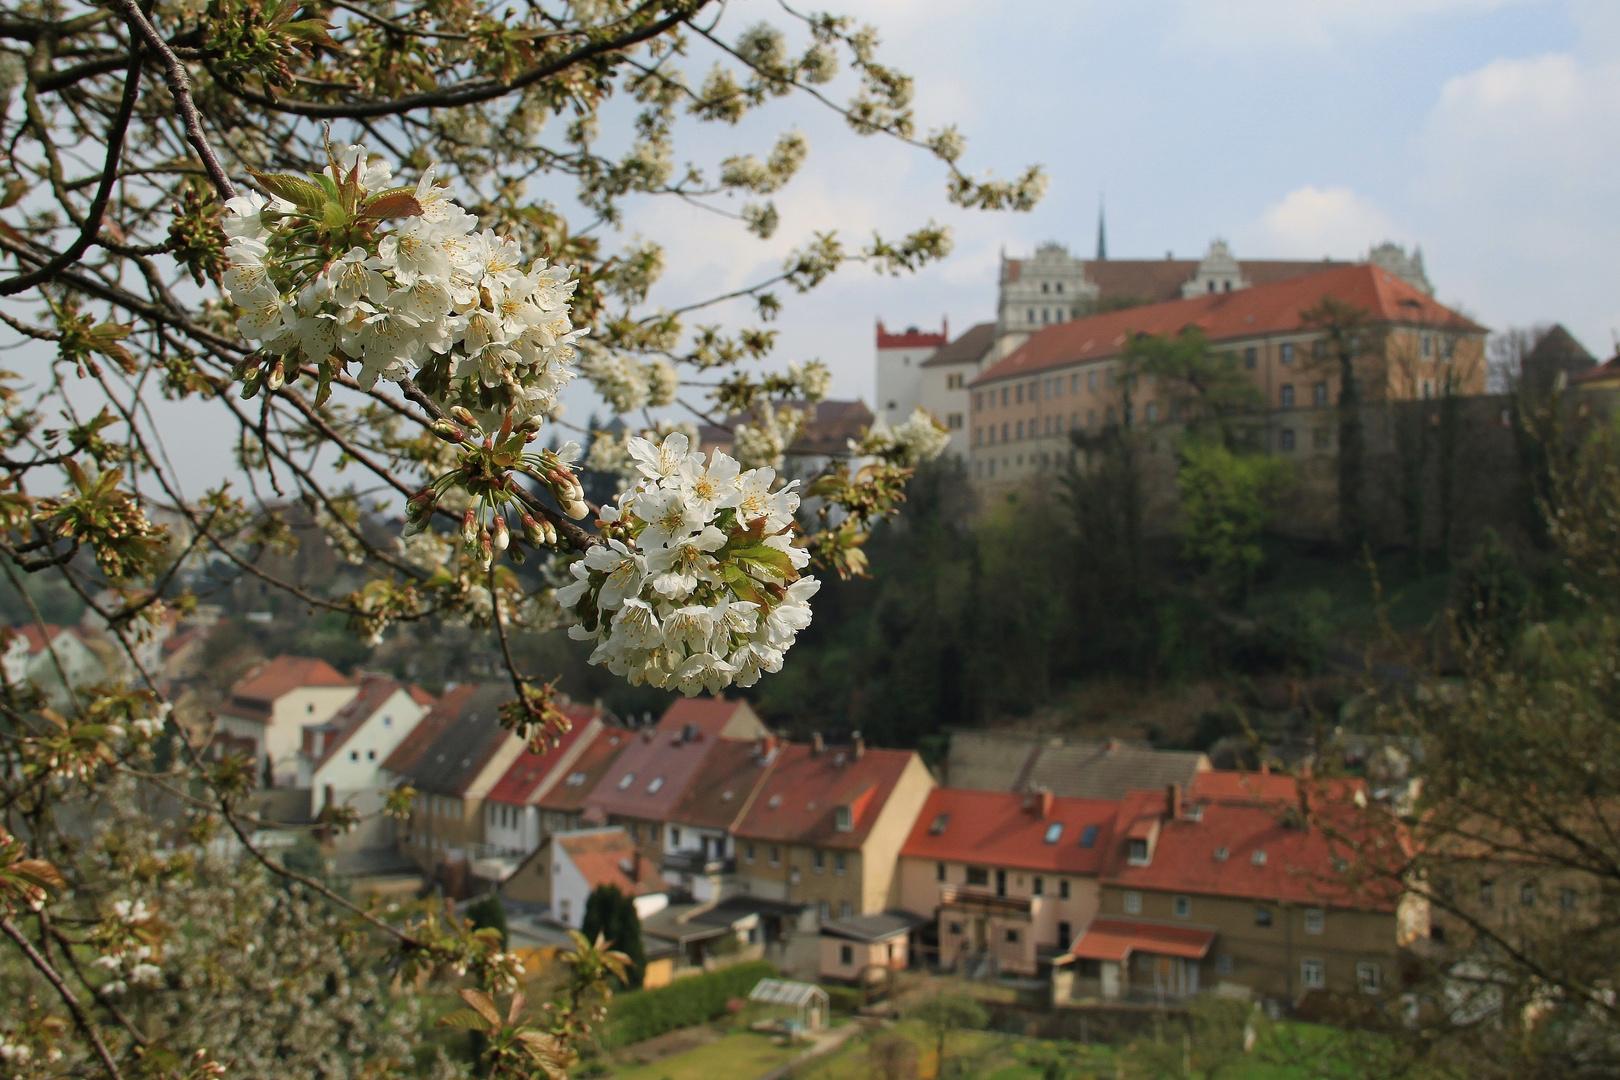 Frühling in Bautzen